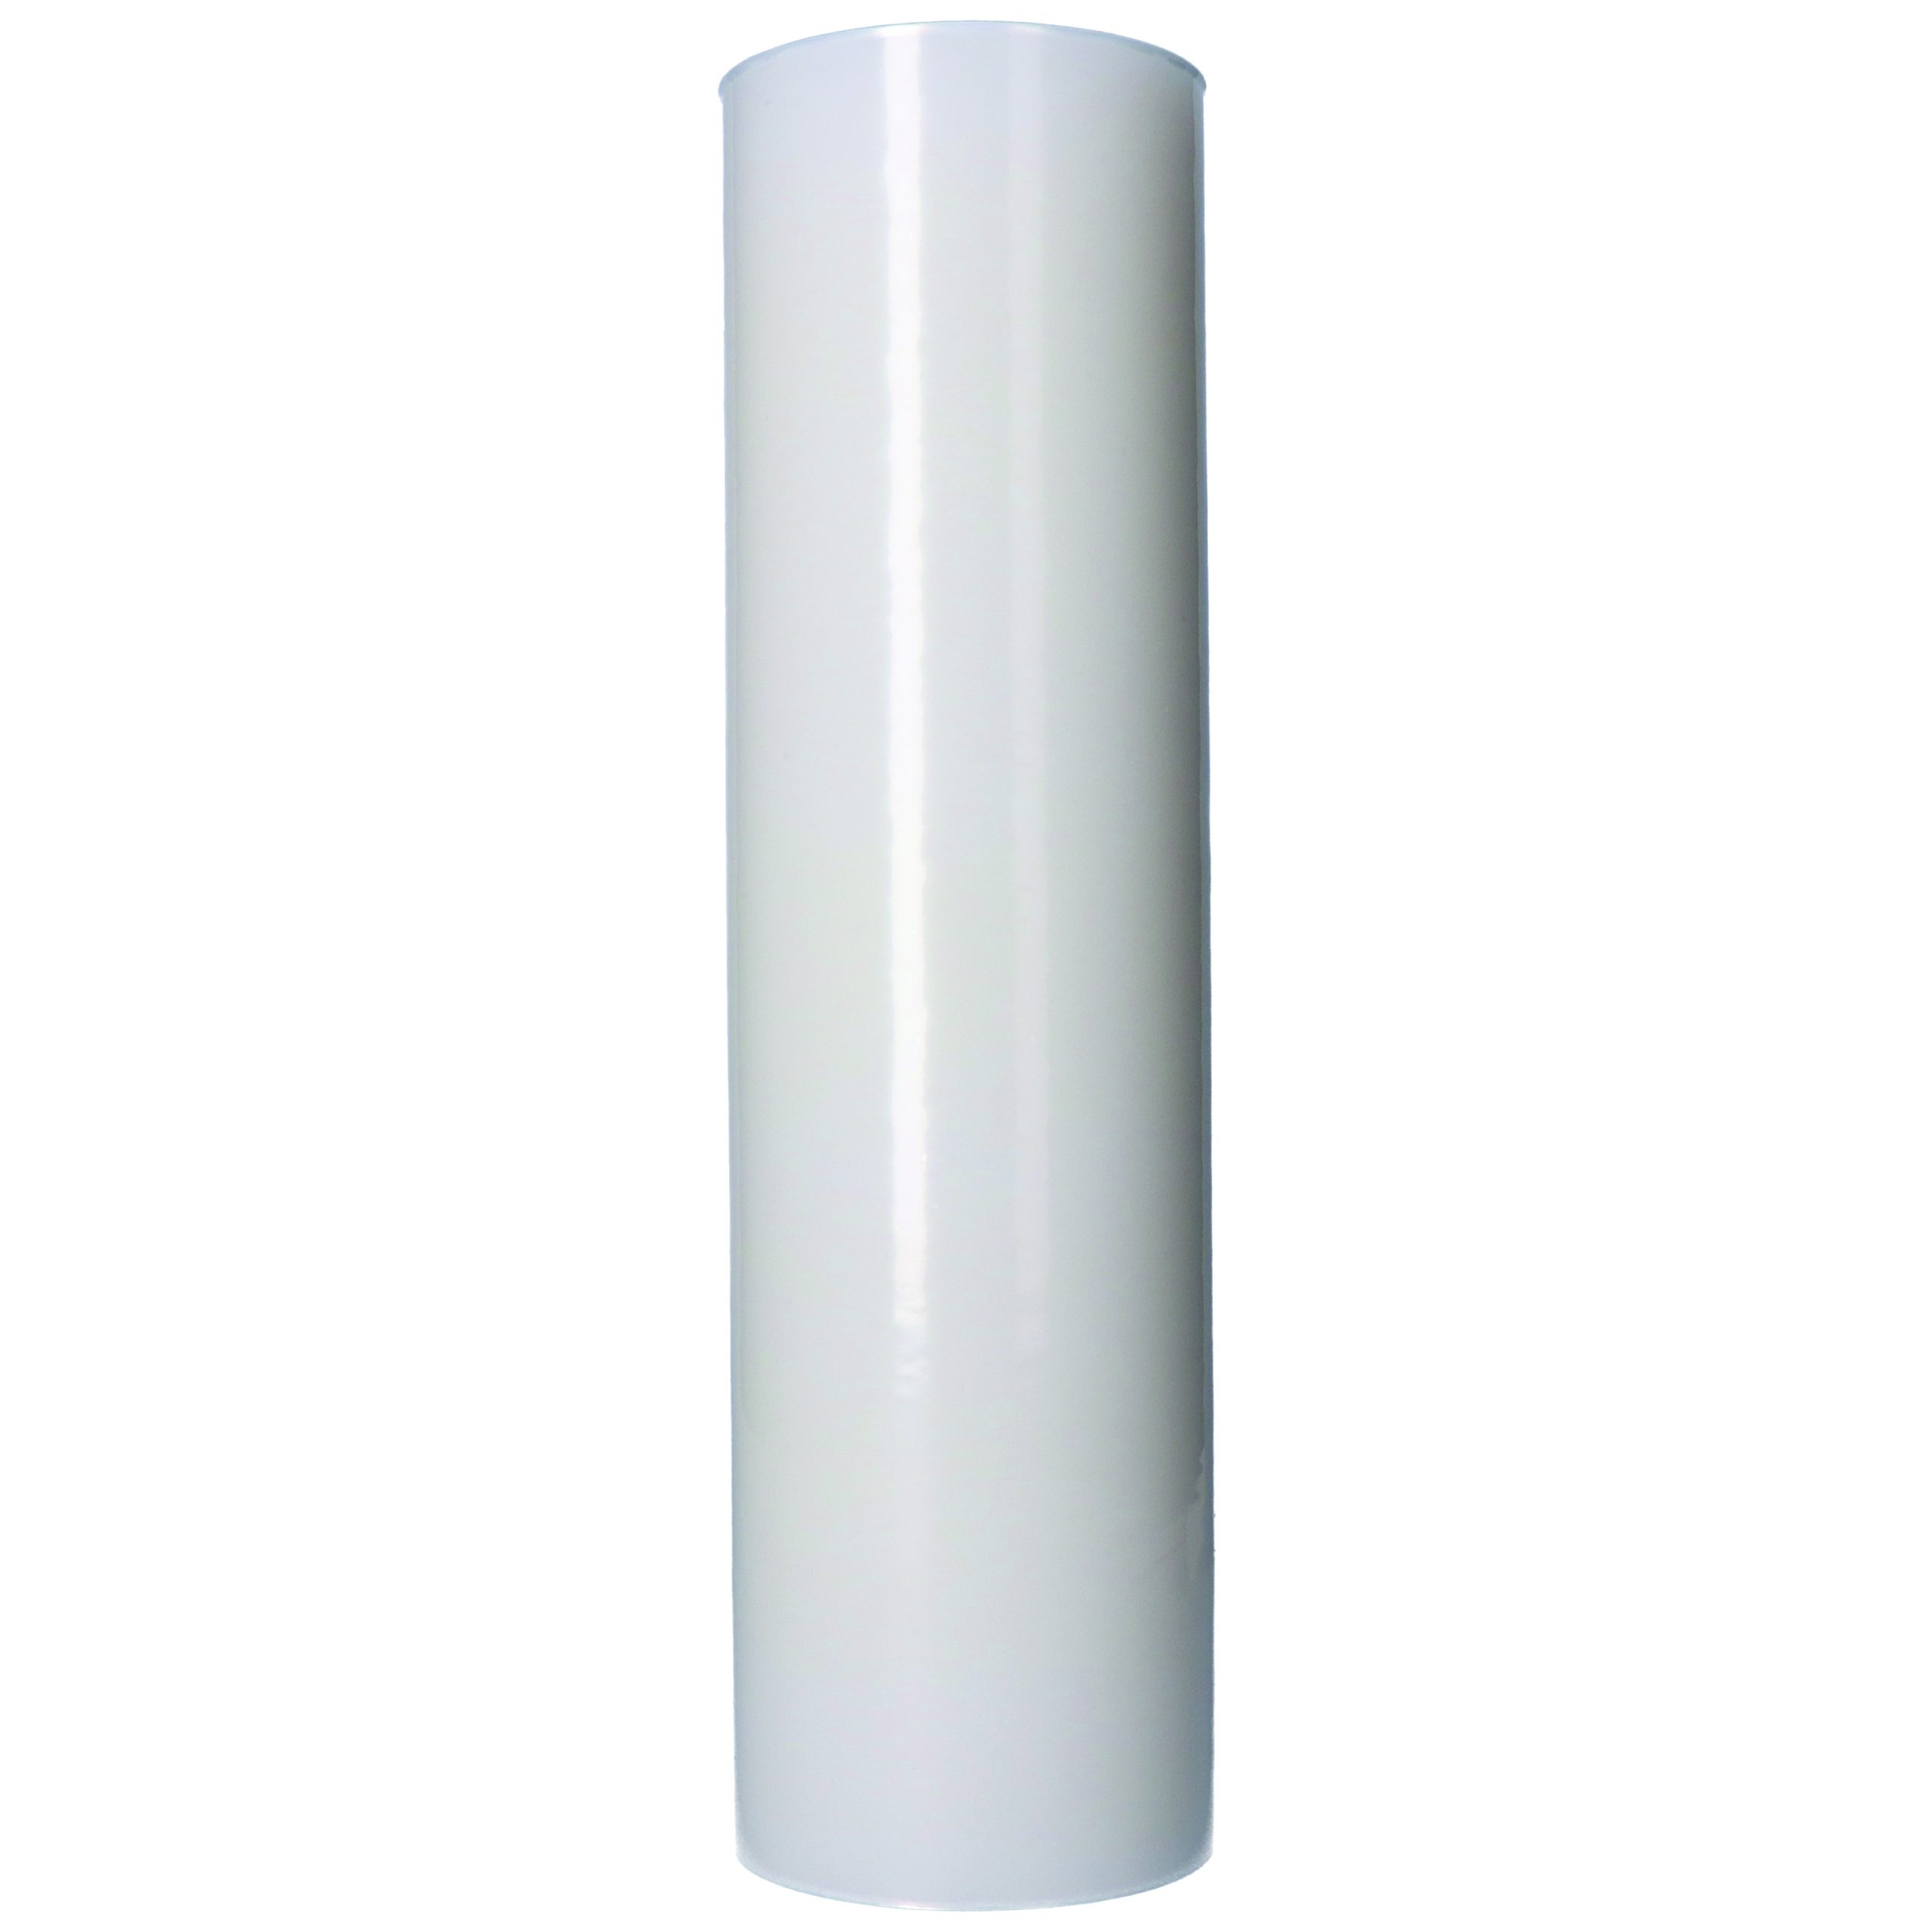 Protection film spray booth lighting